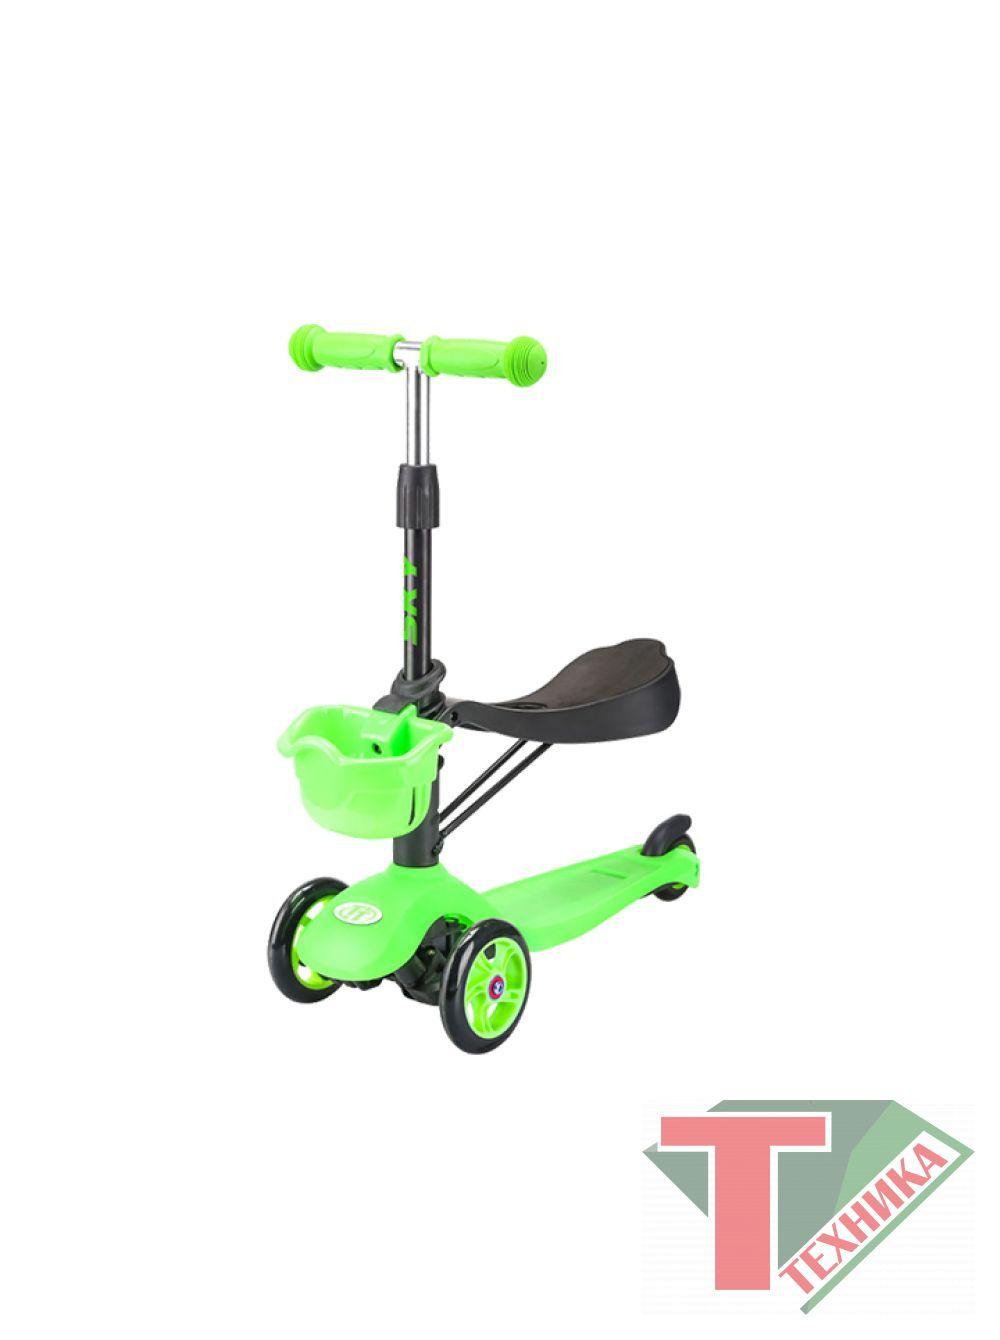 Самокат TT Sky scooter new 1/4